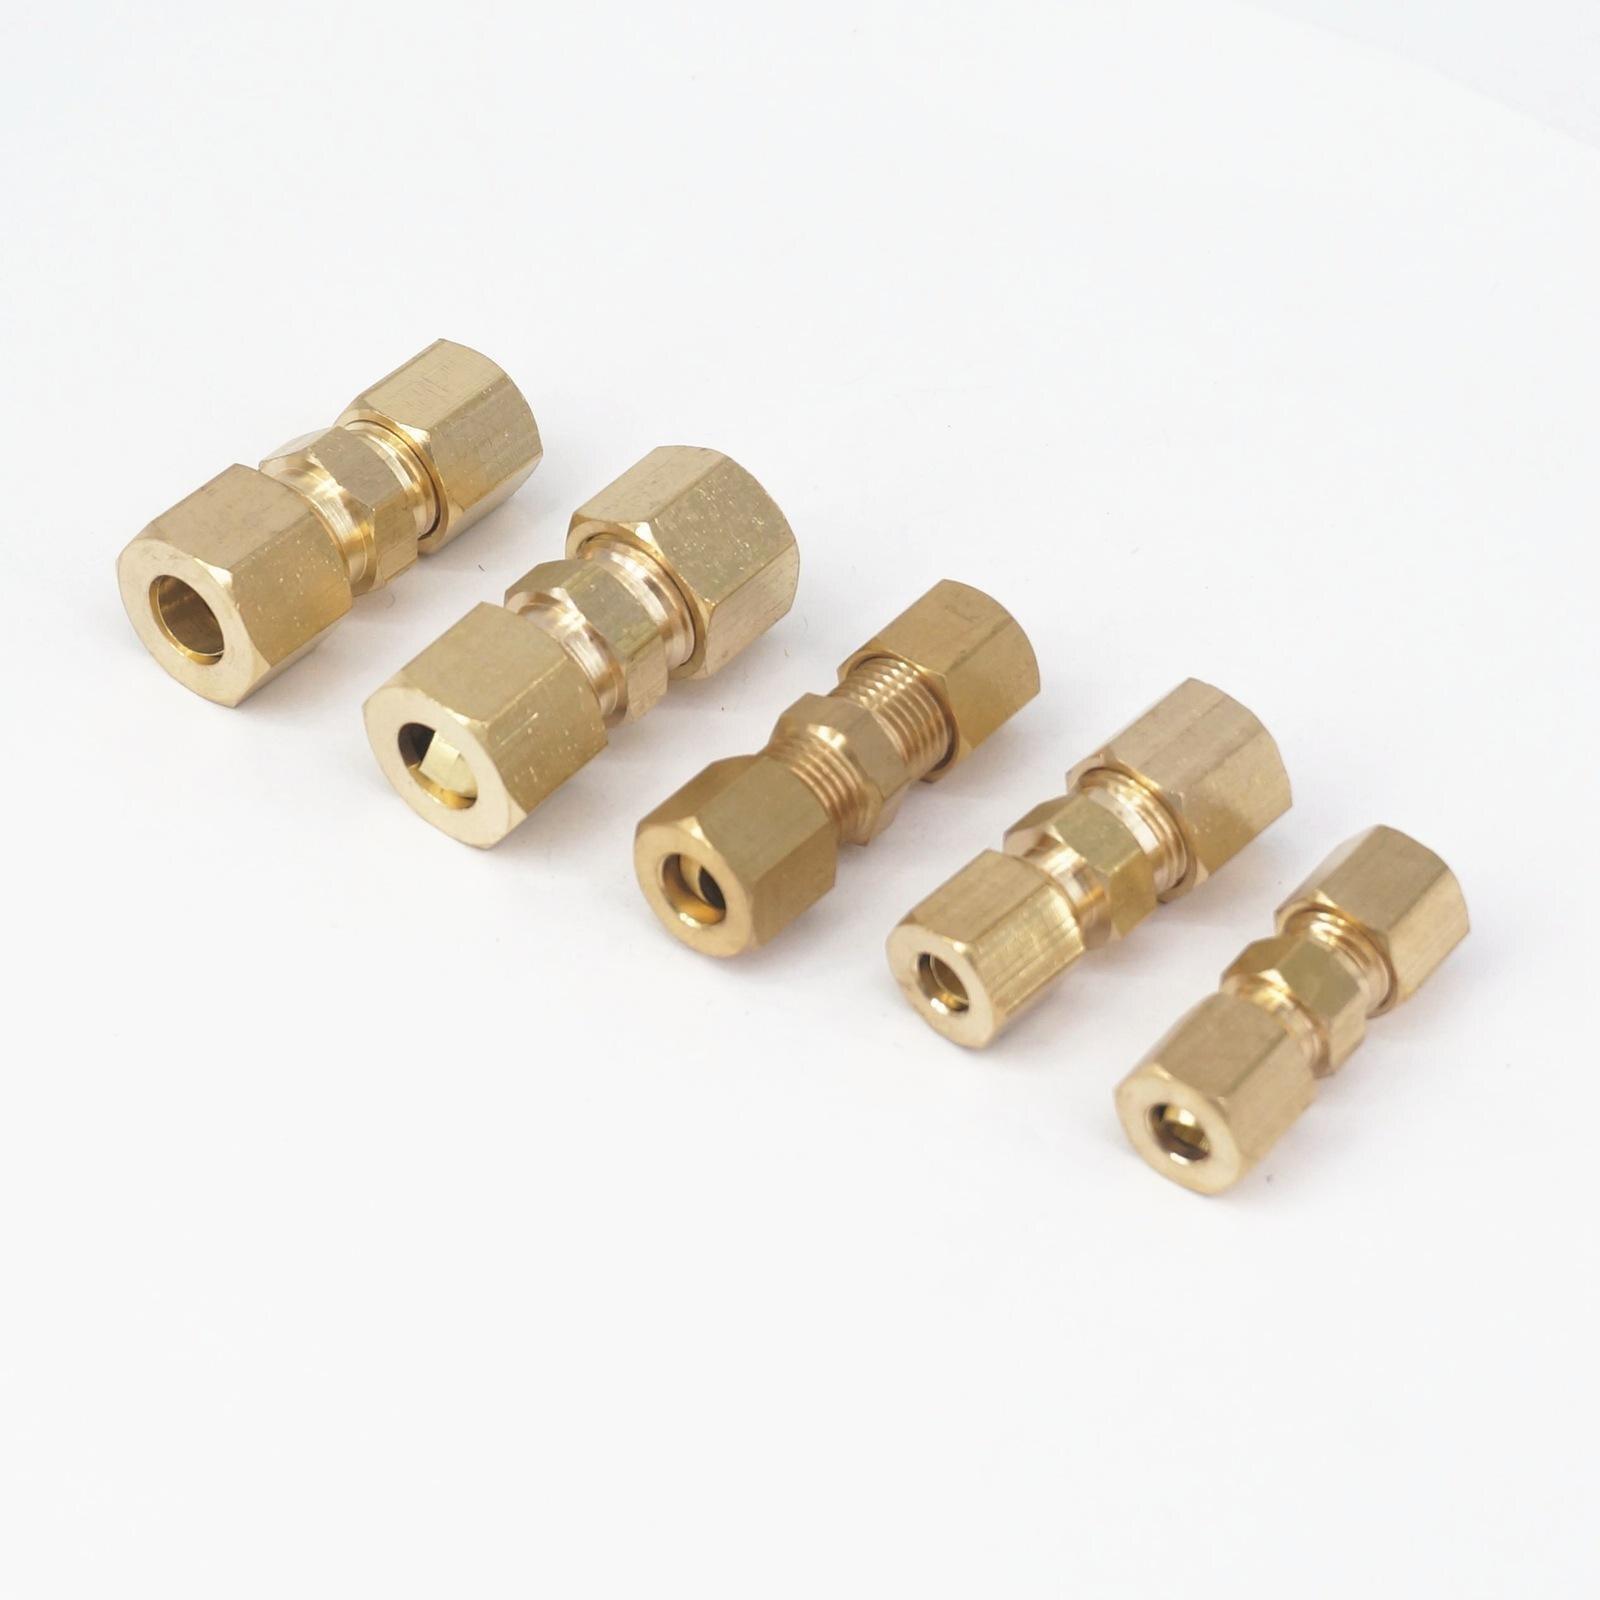 "Ajuste 3/16 ""1/4"" 5/16 ""tubo OD reductor recto Unión de compresión accesorios de tubería de latón"